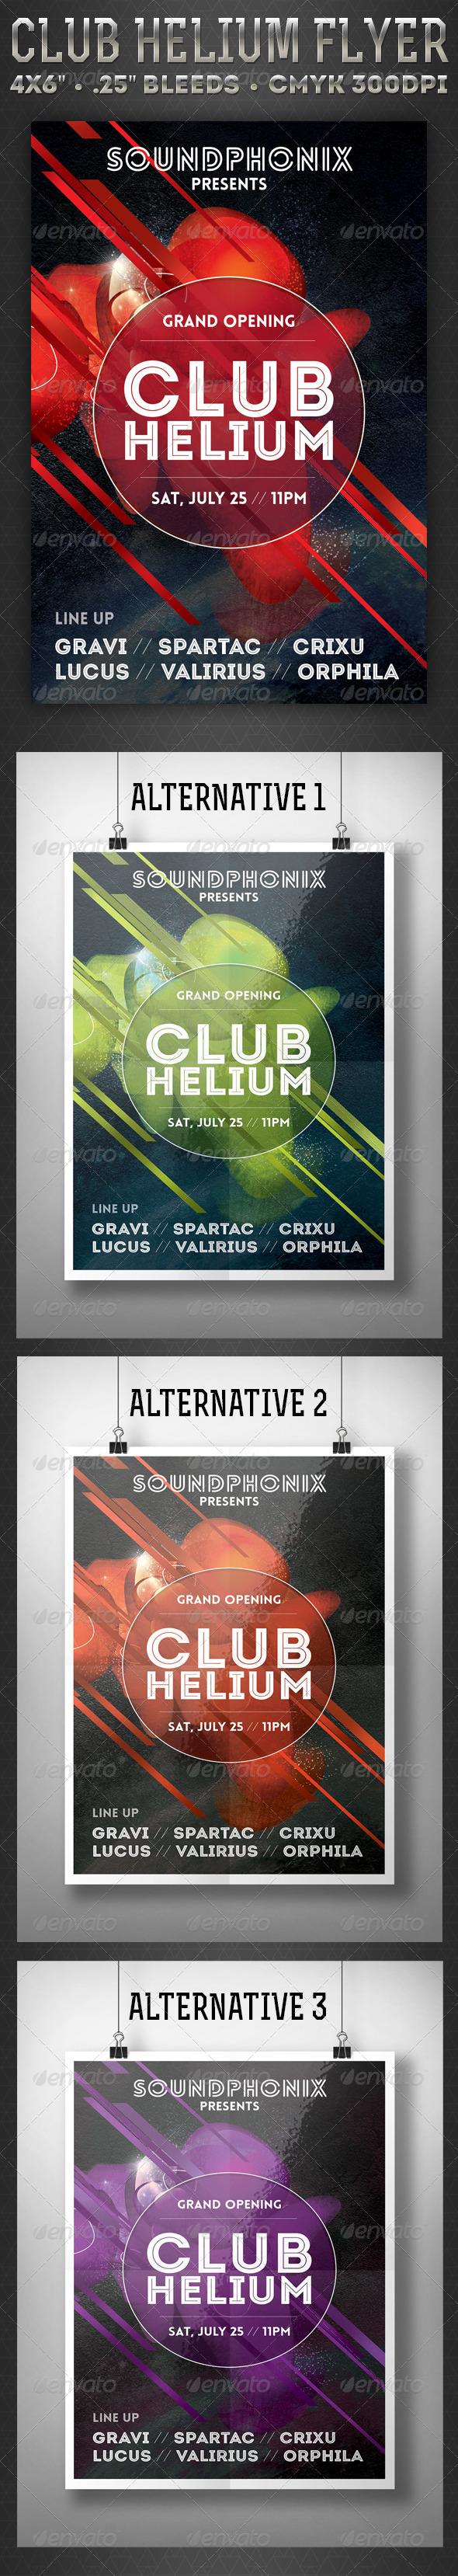 Club Helium Flyer